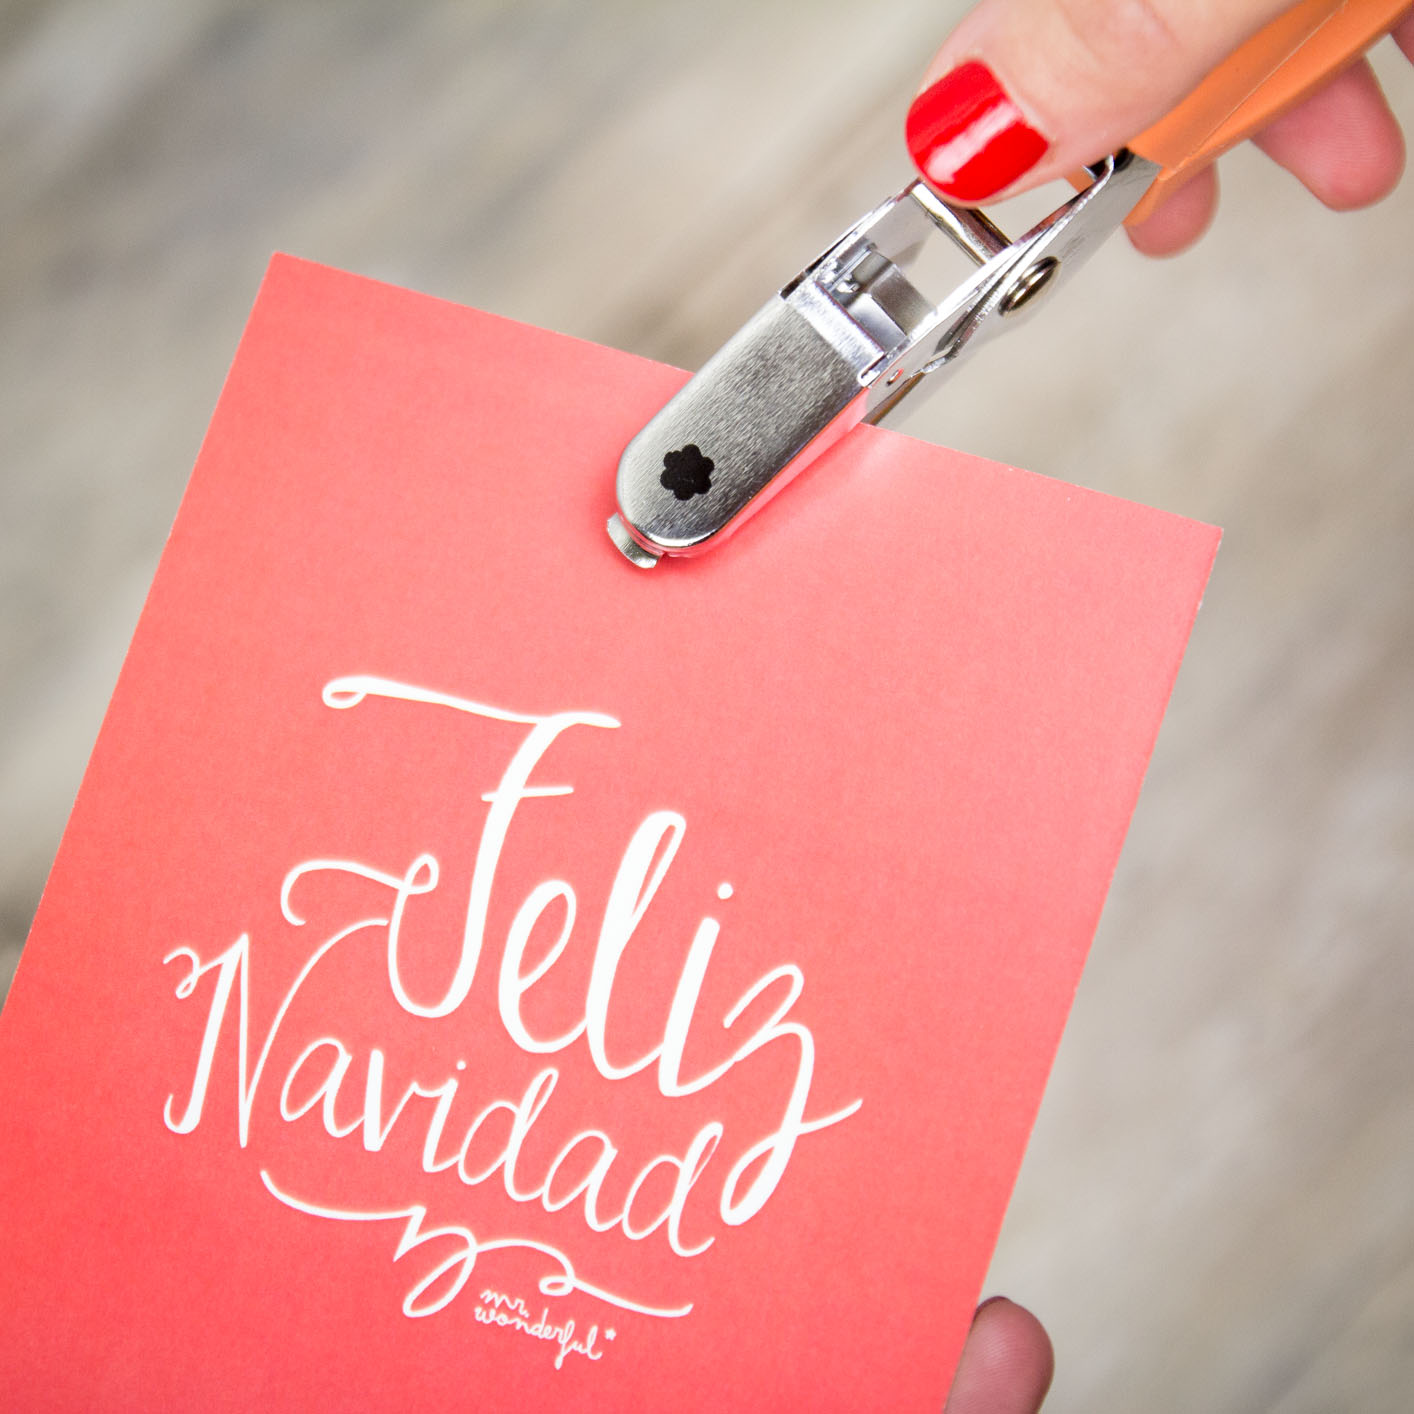 Mr_wonderful_tutorial_descargable_freebie_tarjeta_regalo_navidad_040